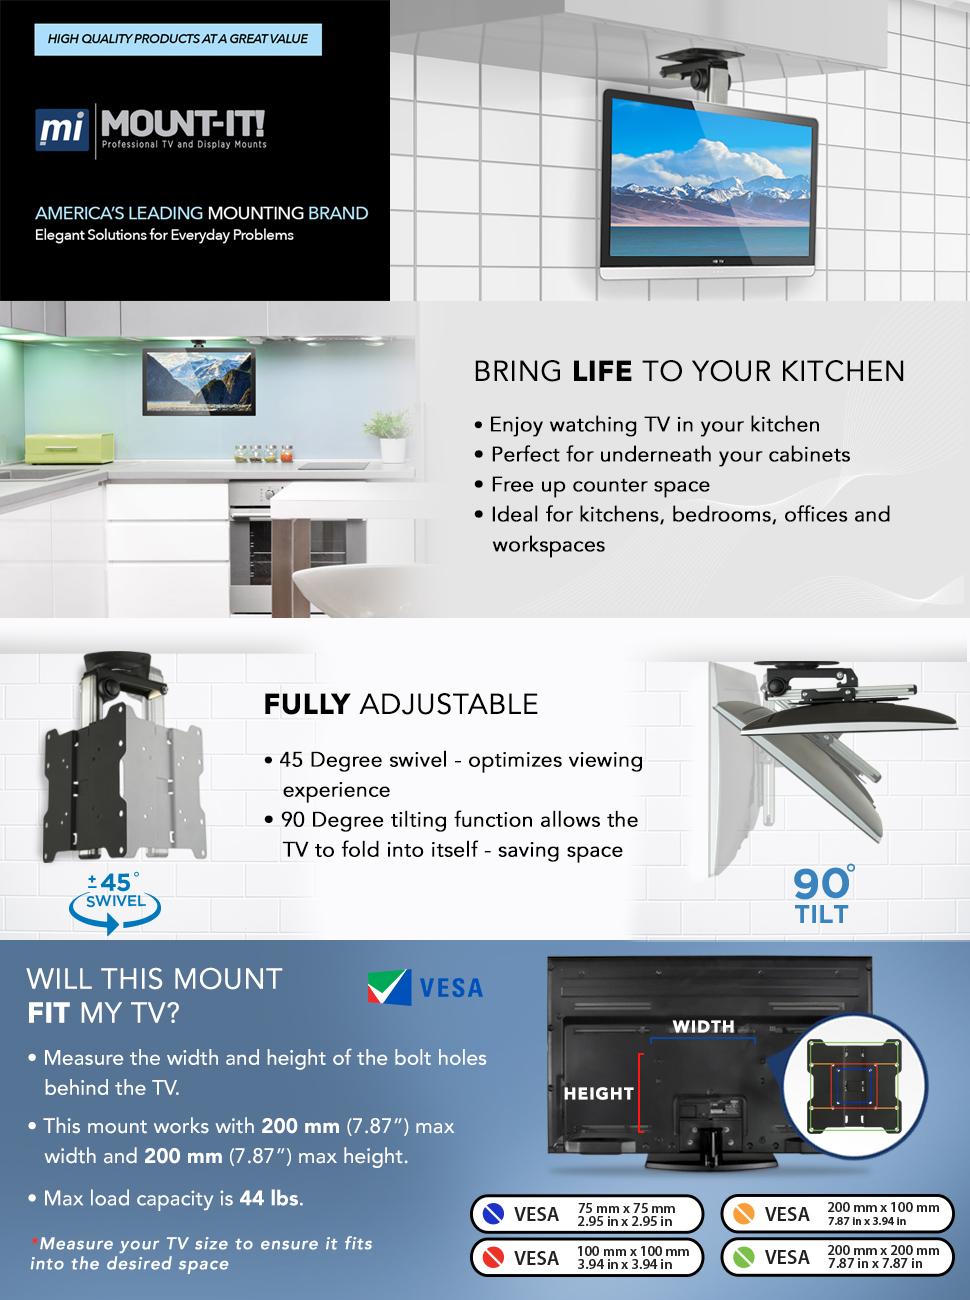 Amazon.com: Mount-It! MI-4222 TV Ceiling Mount Kitchen Under Cabinet ...